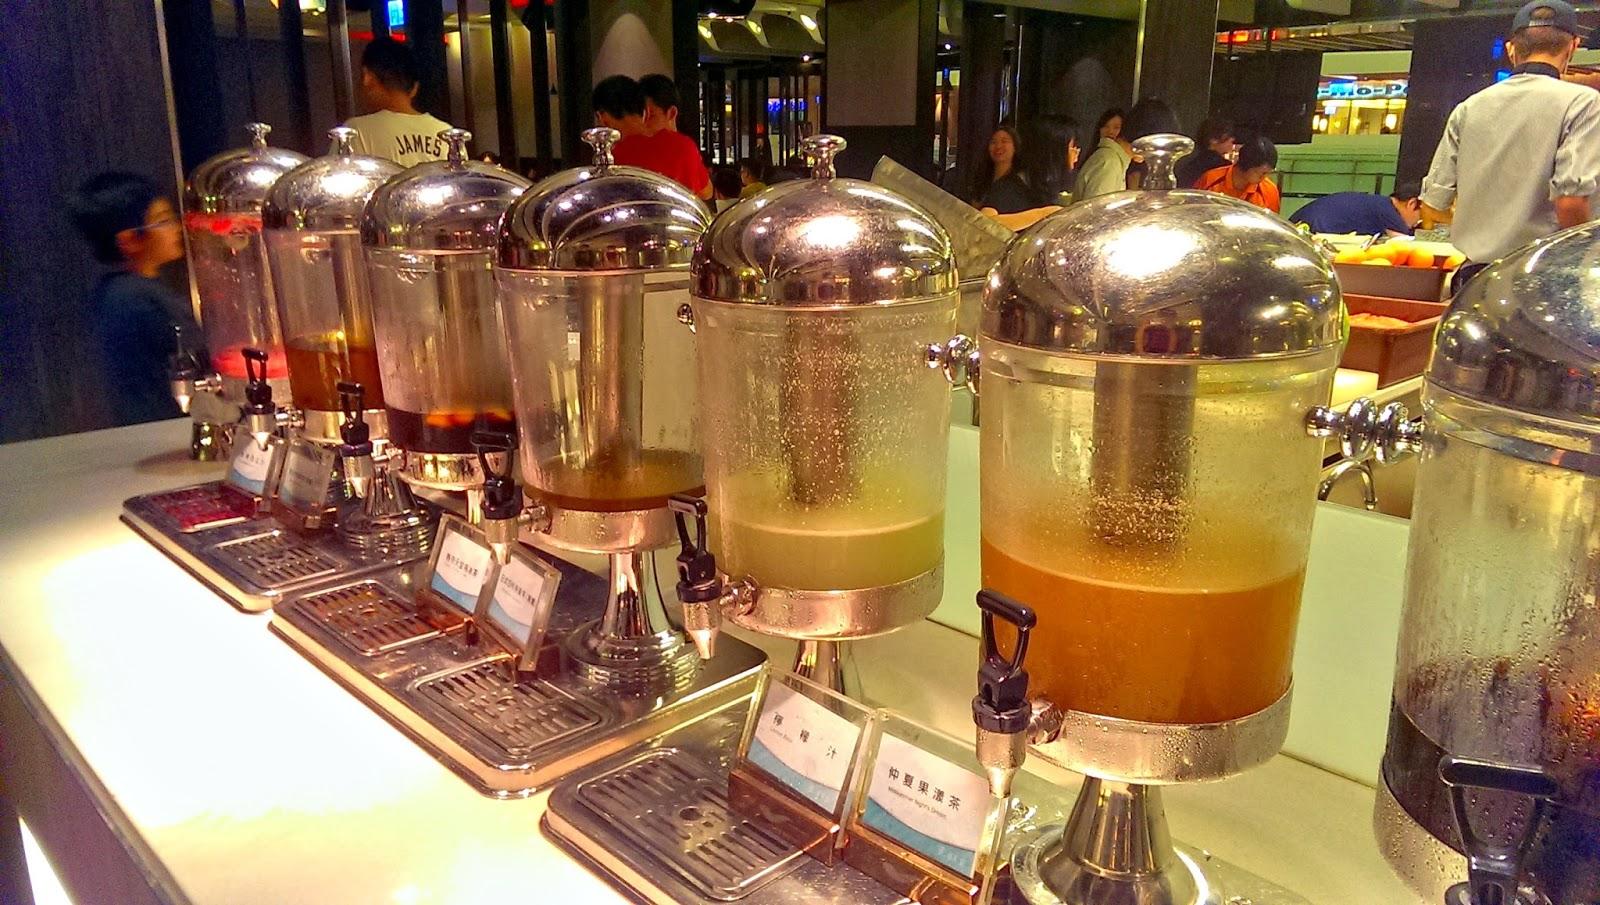 2015 07 01%2B19.18.08 - [食記] 台北京站 - 饗食天堂,有生魚片吃到飽的高級自助餐廳!